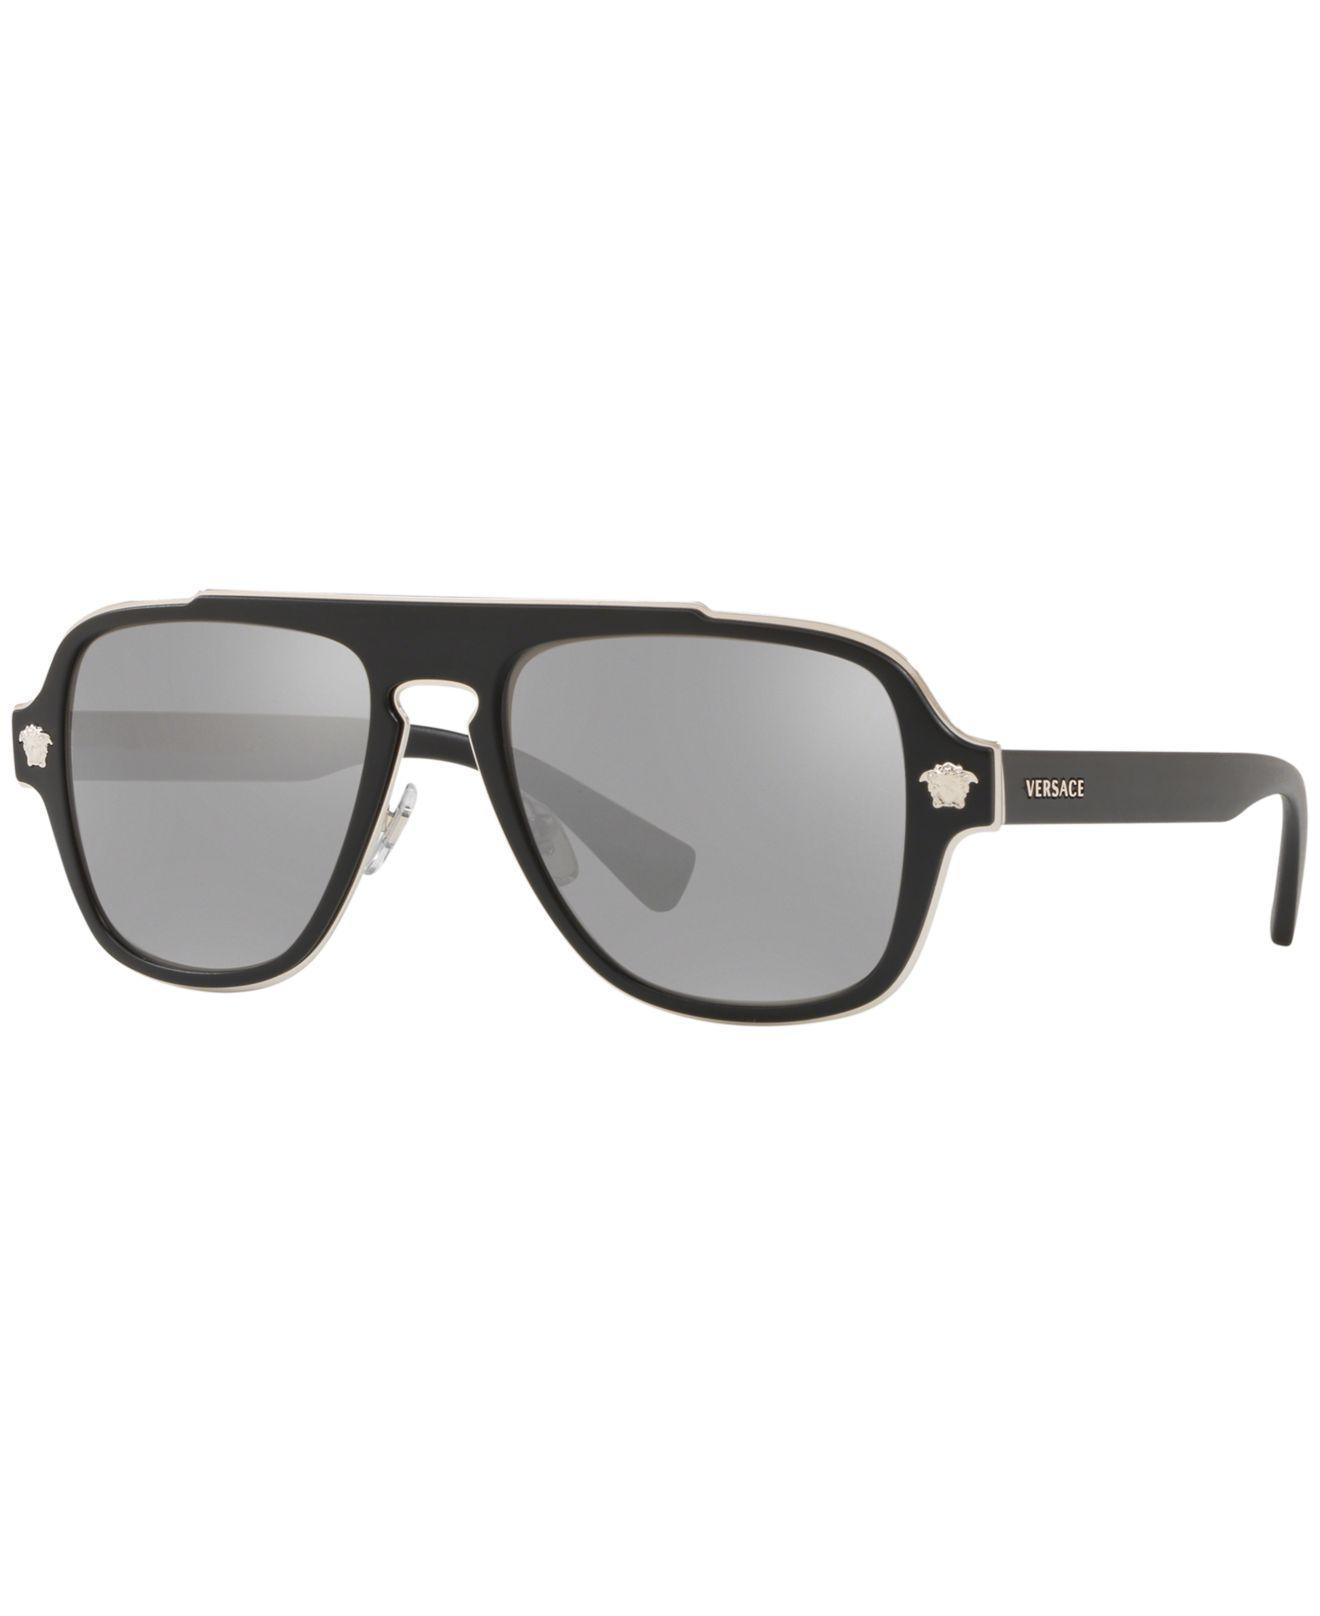 21bccada1a Versace - Multicolor Sunglasses